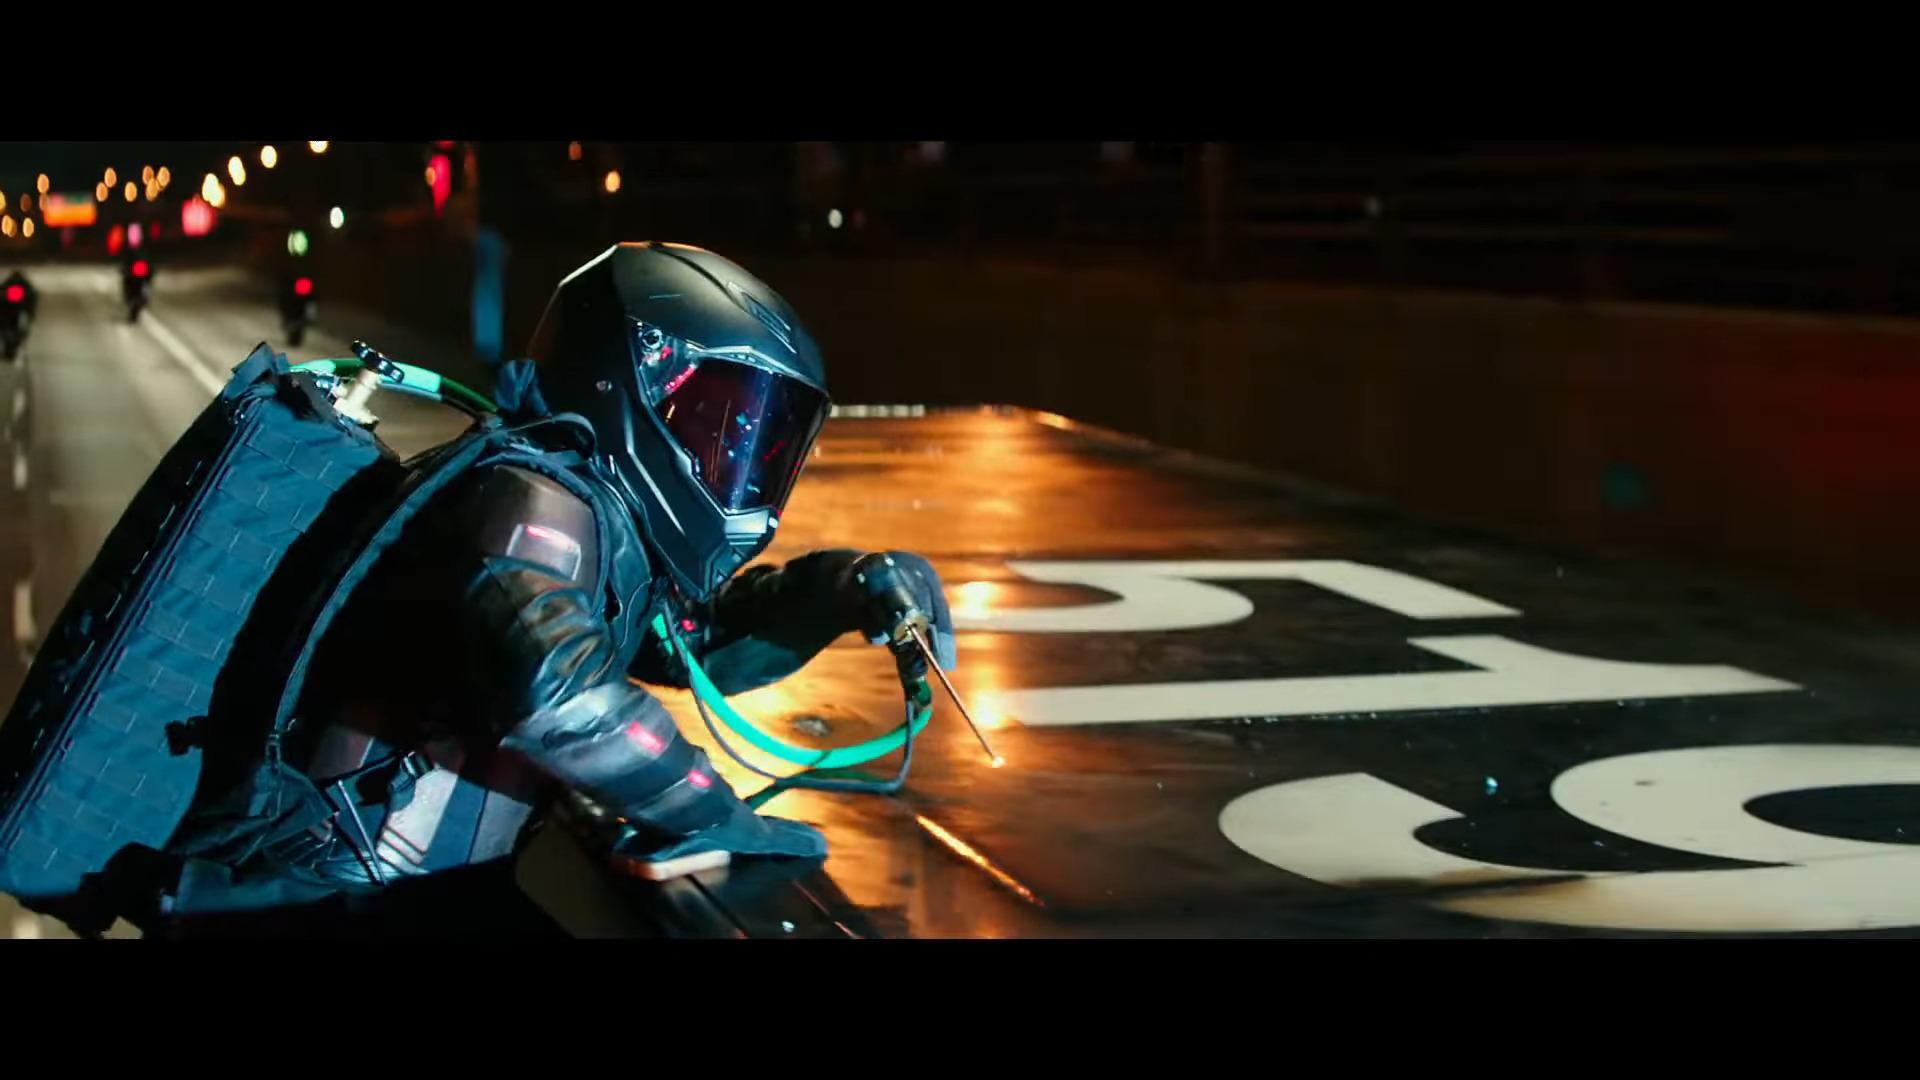 Teenage Mutant Ninja Turtles: Out of the Shadows (2016) (Trailers)